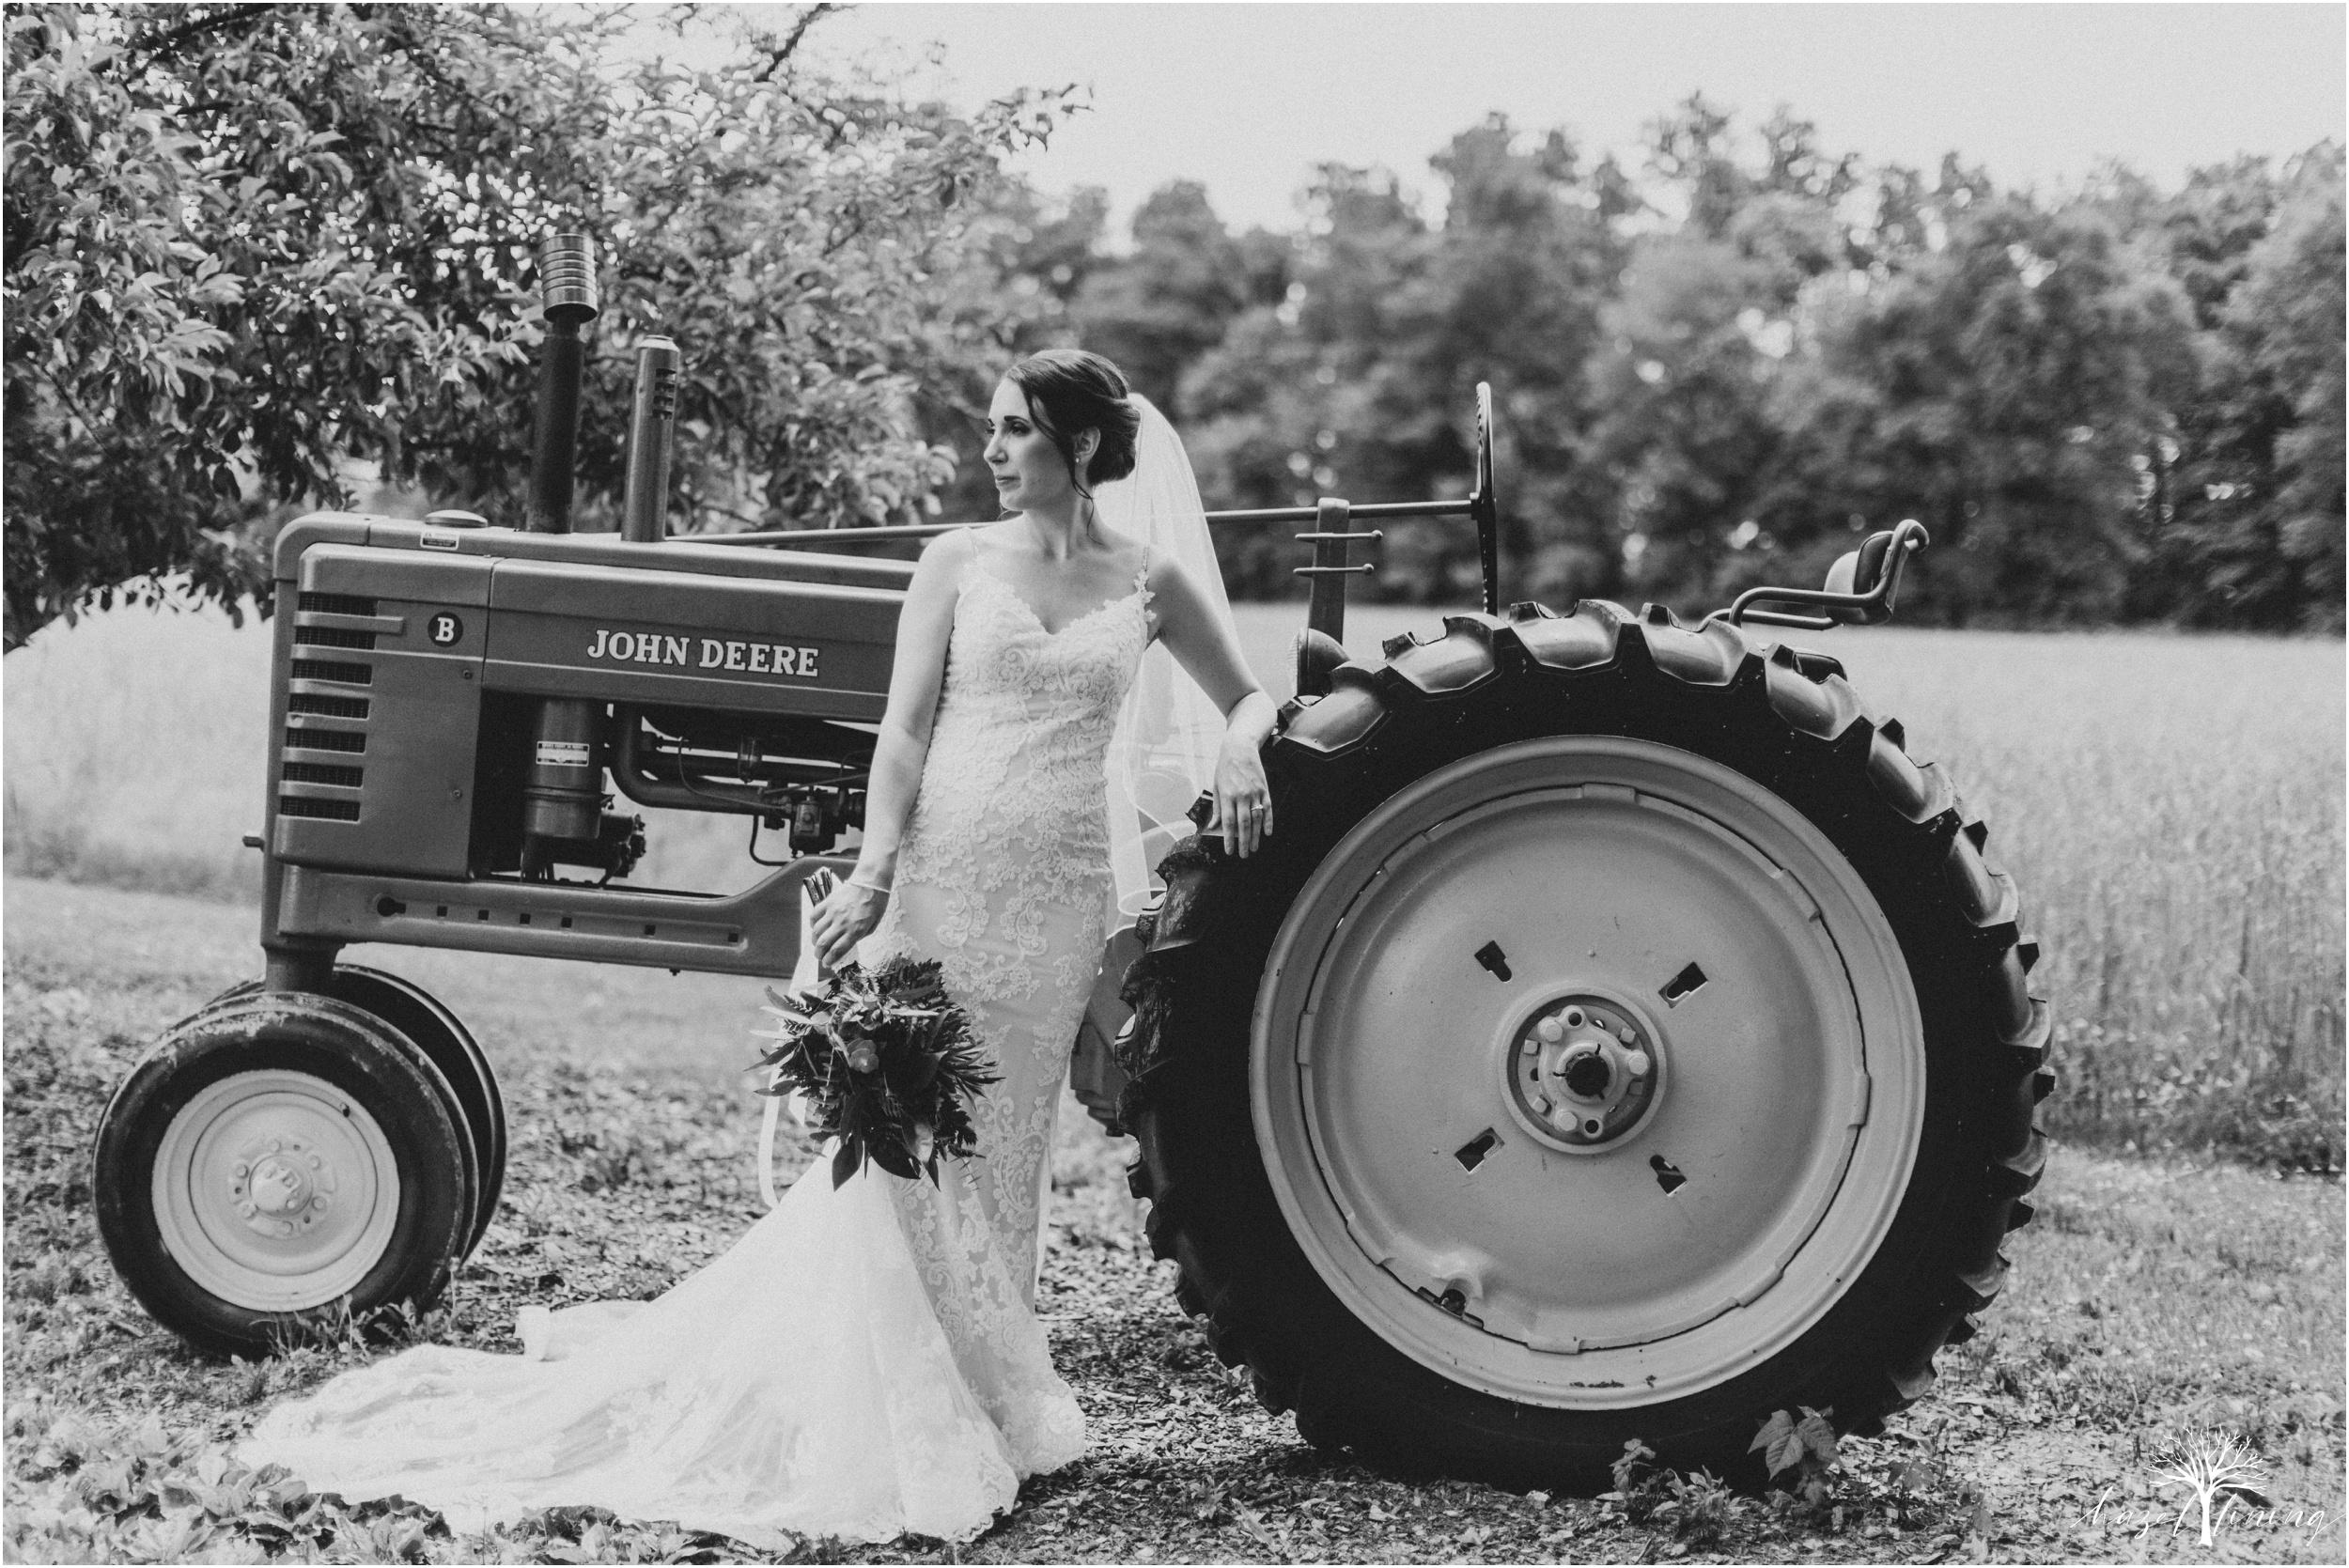 hazel-lining-travel-wedding-elopement-photography-lisa-landon-shoemaker-the-farm-bakery-and-events-bucks-county-quakertown-pennsylvania-summer-country-outdoor-farm-wedding_0016.jpg